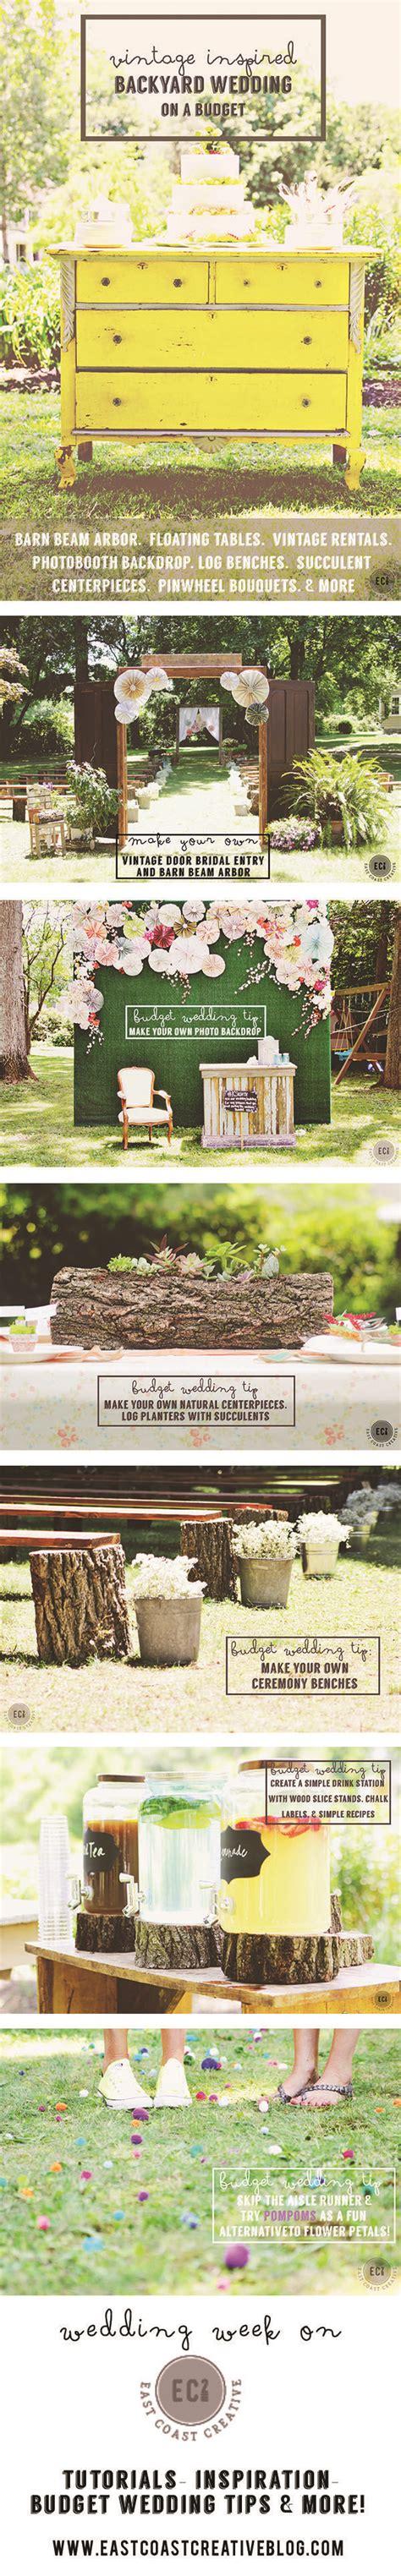 DIY Wedding Tips on a Budget Vintage Inspired Backyard